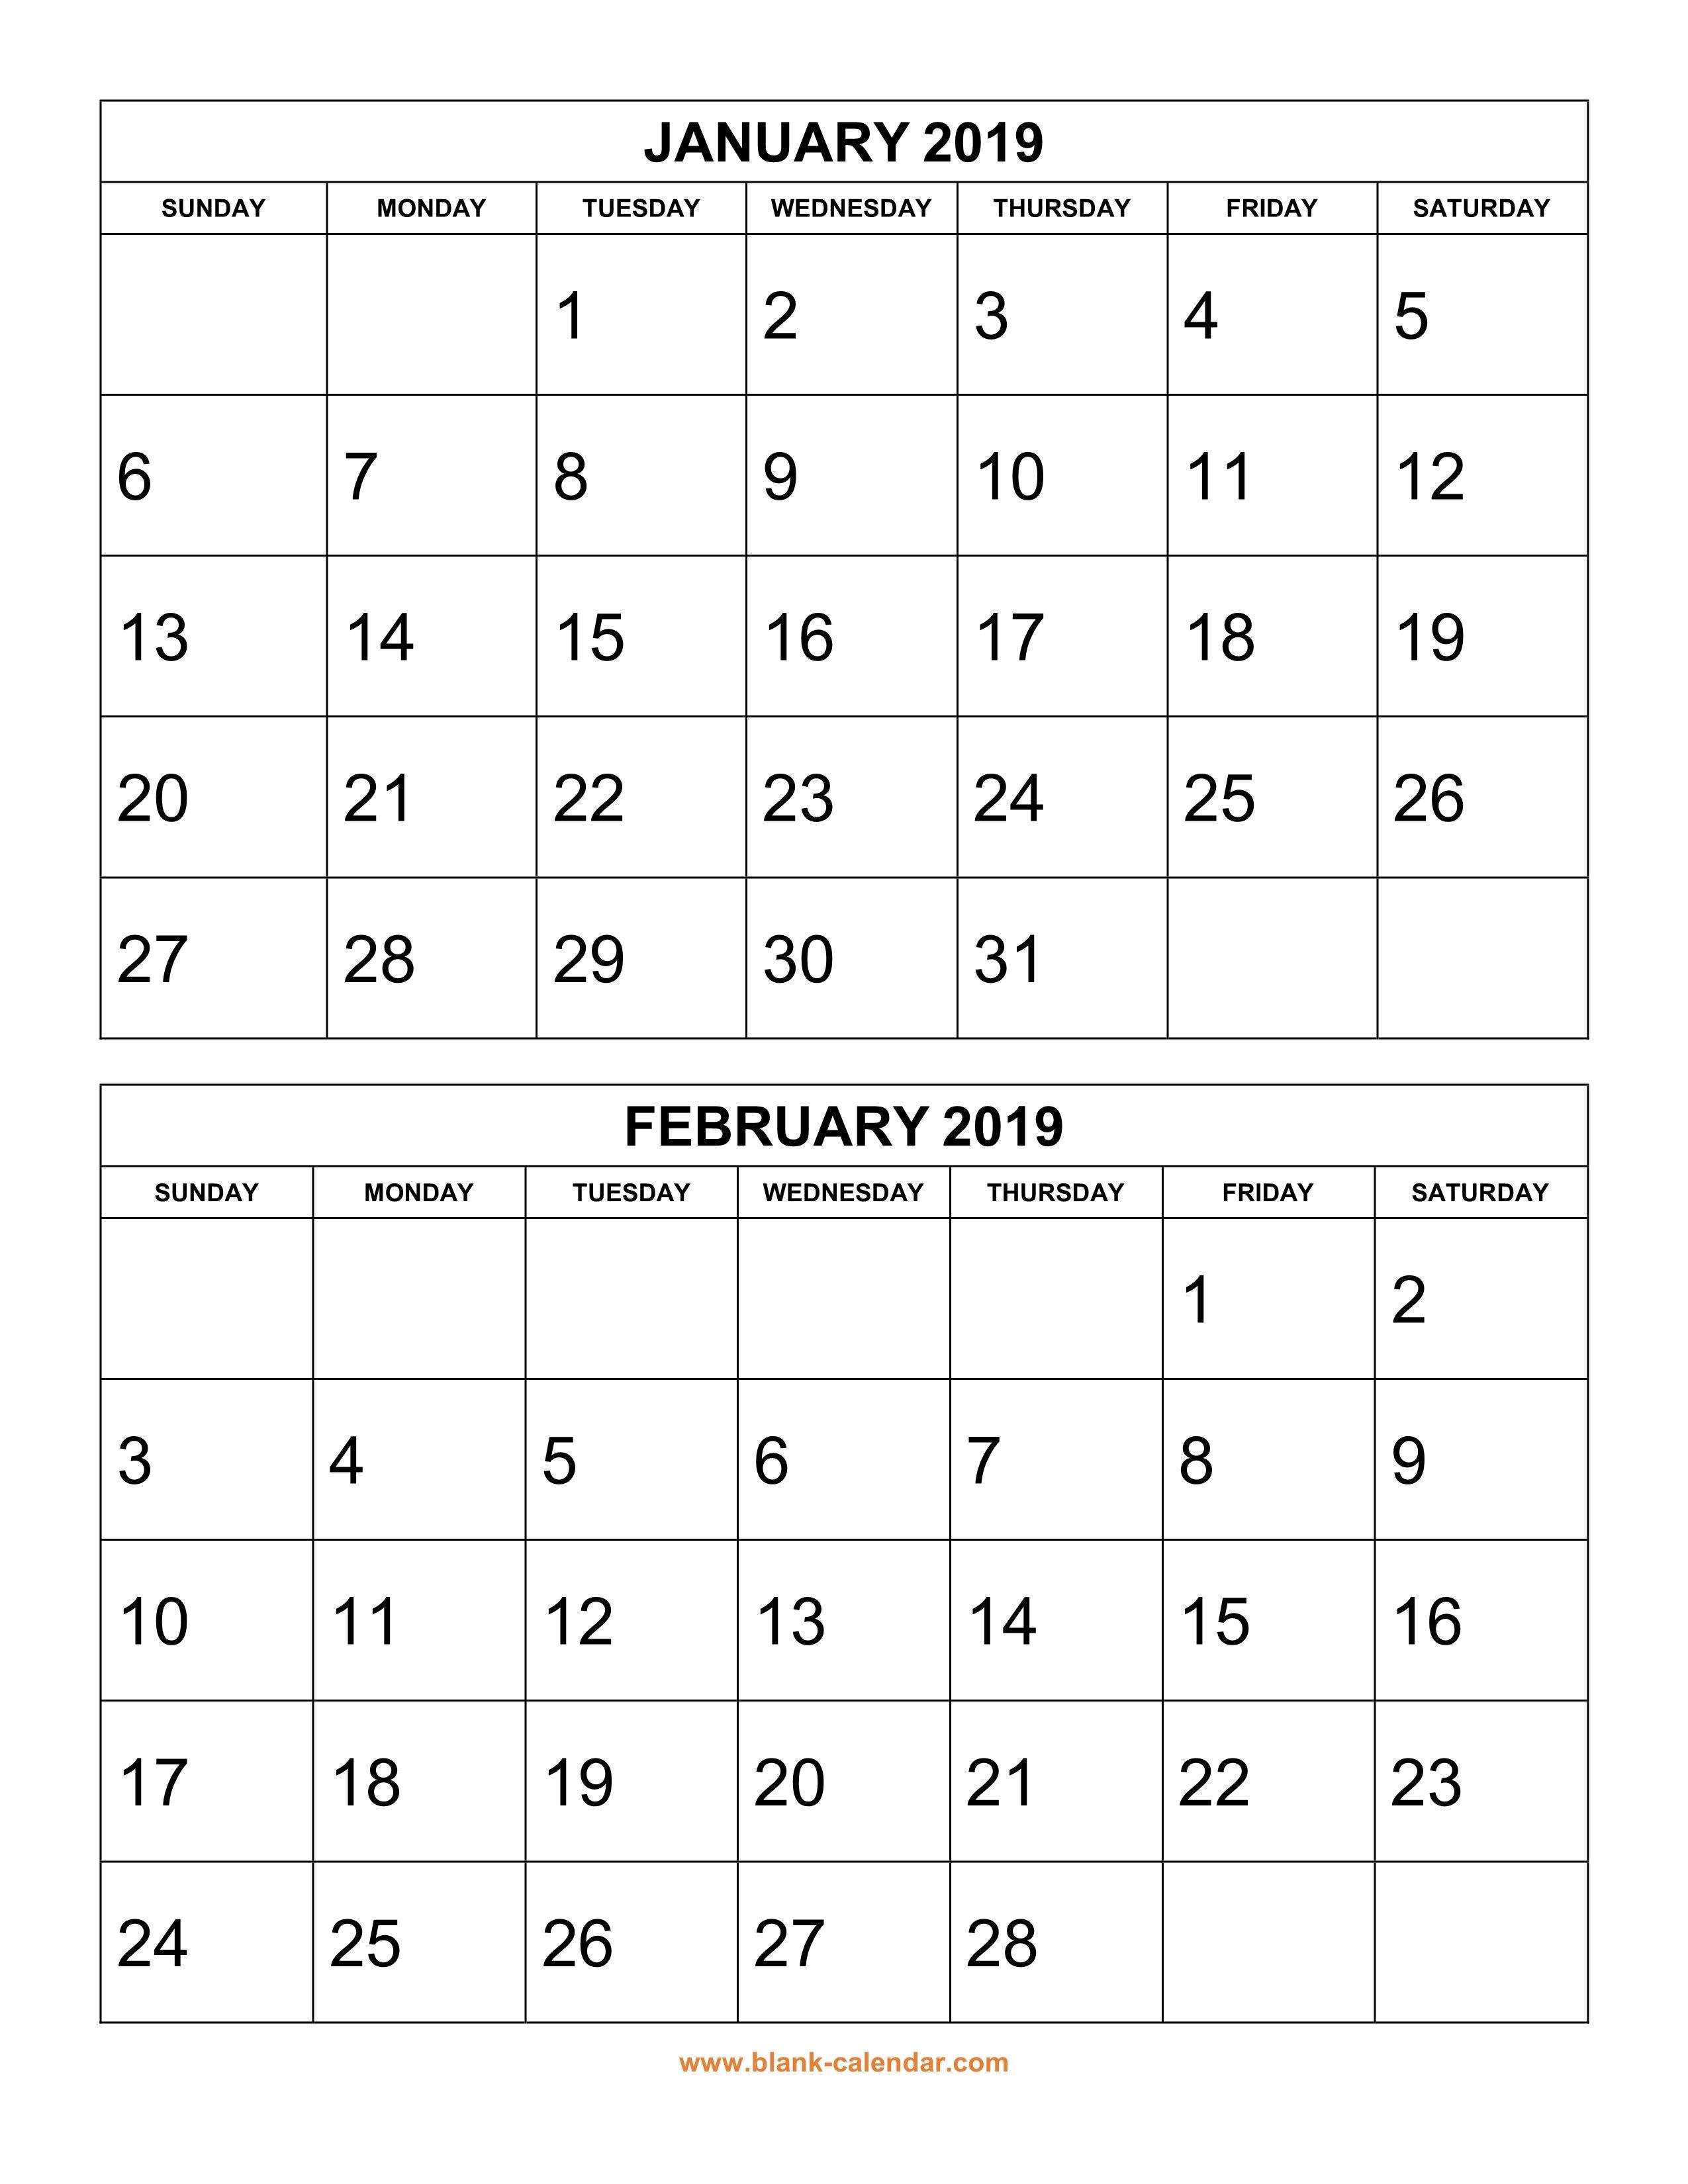 Free Download Printable Calendar 2019, 2 Months Per Page, 6 Pages 2019 Calendar 4 Months Per Page